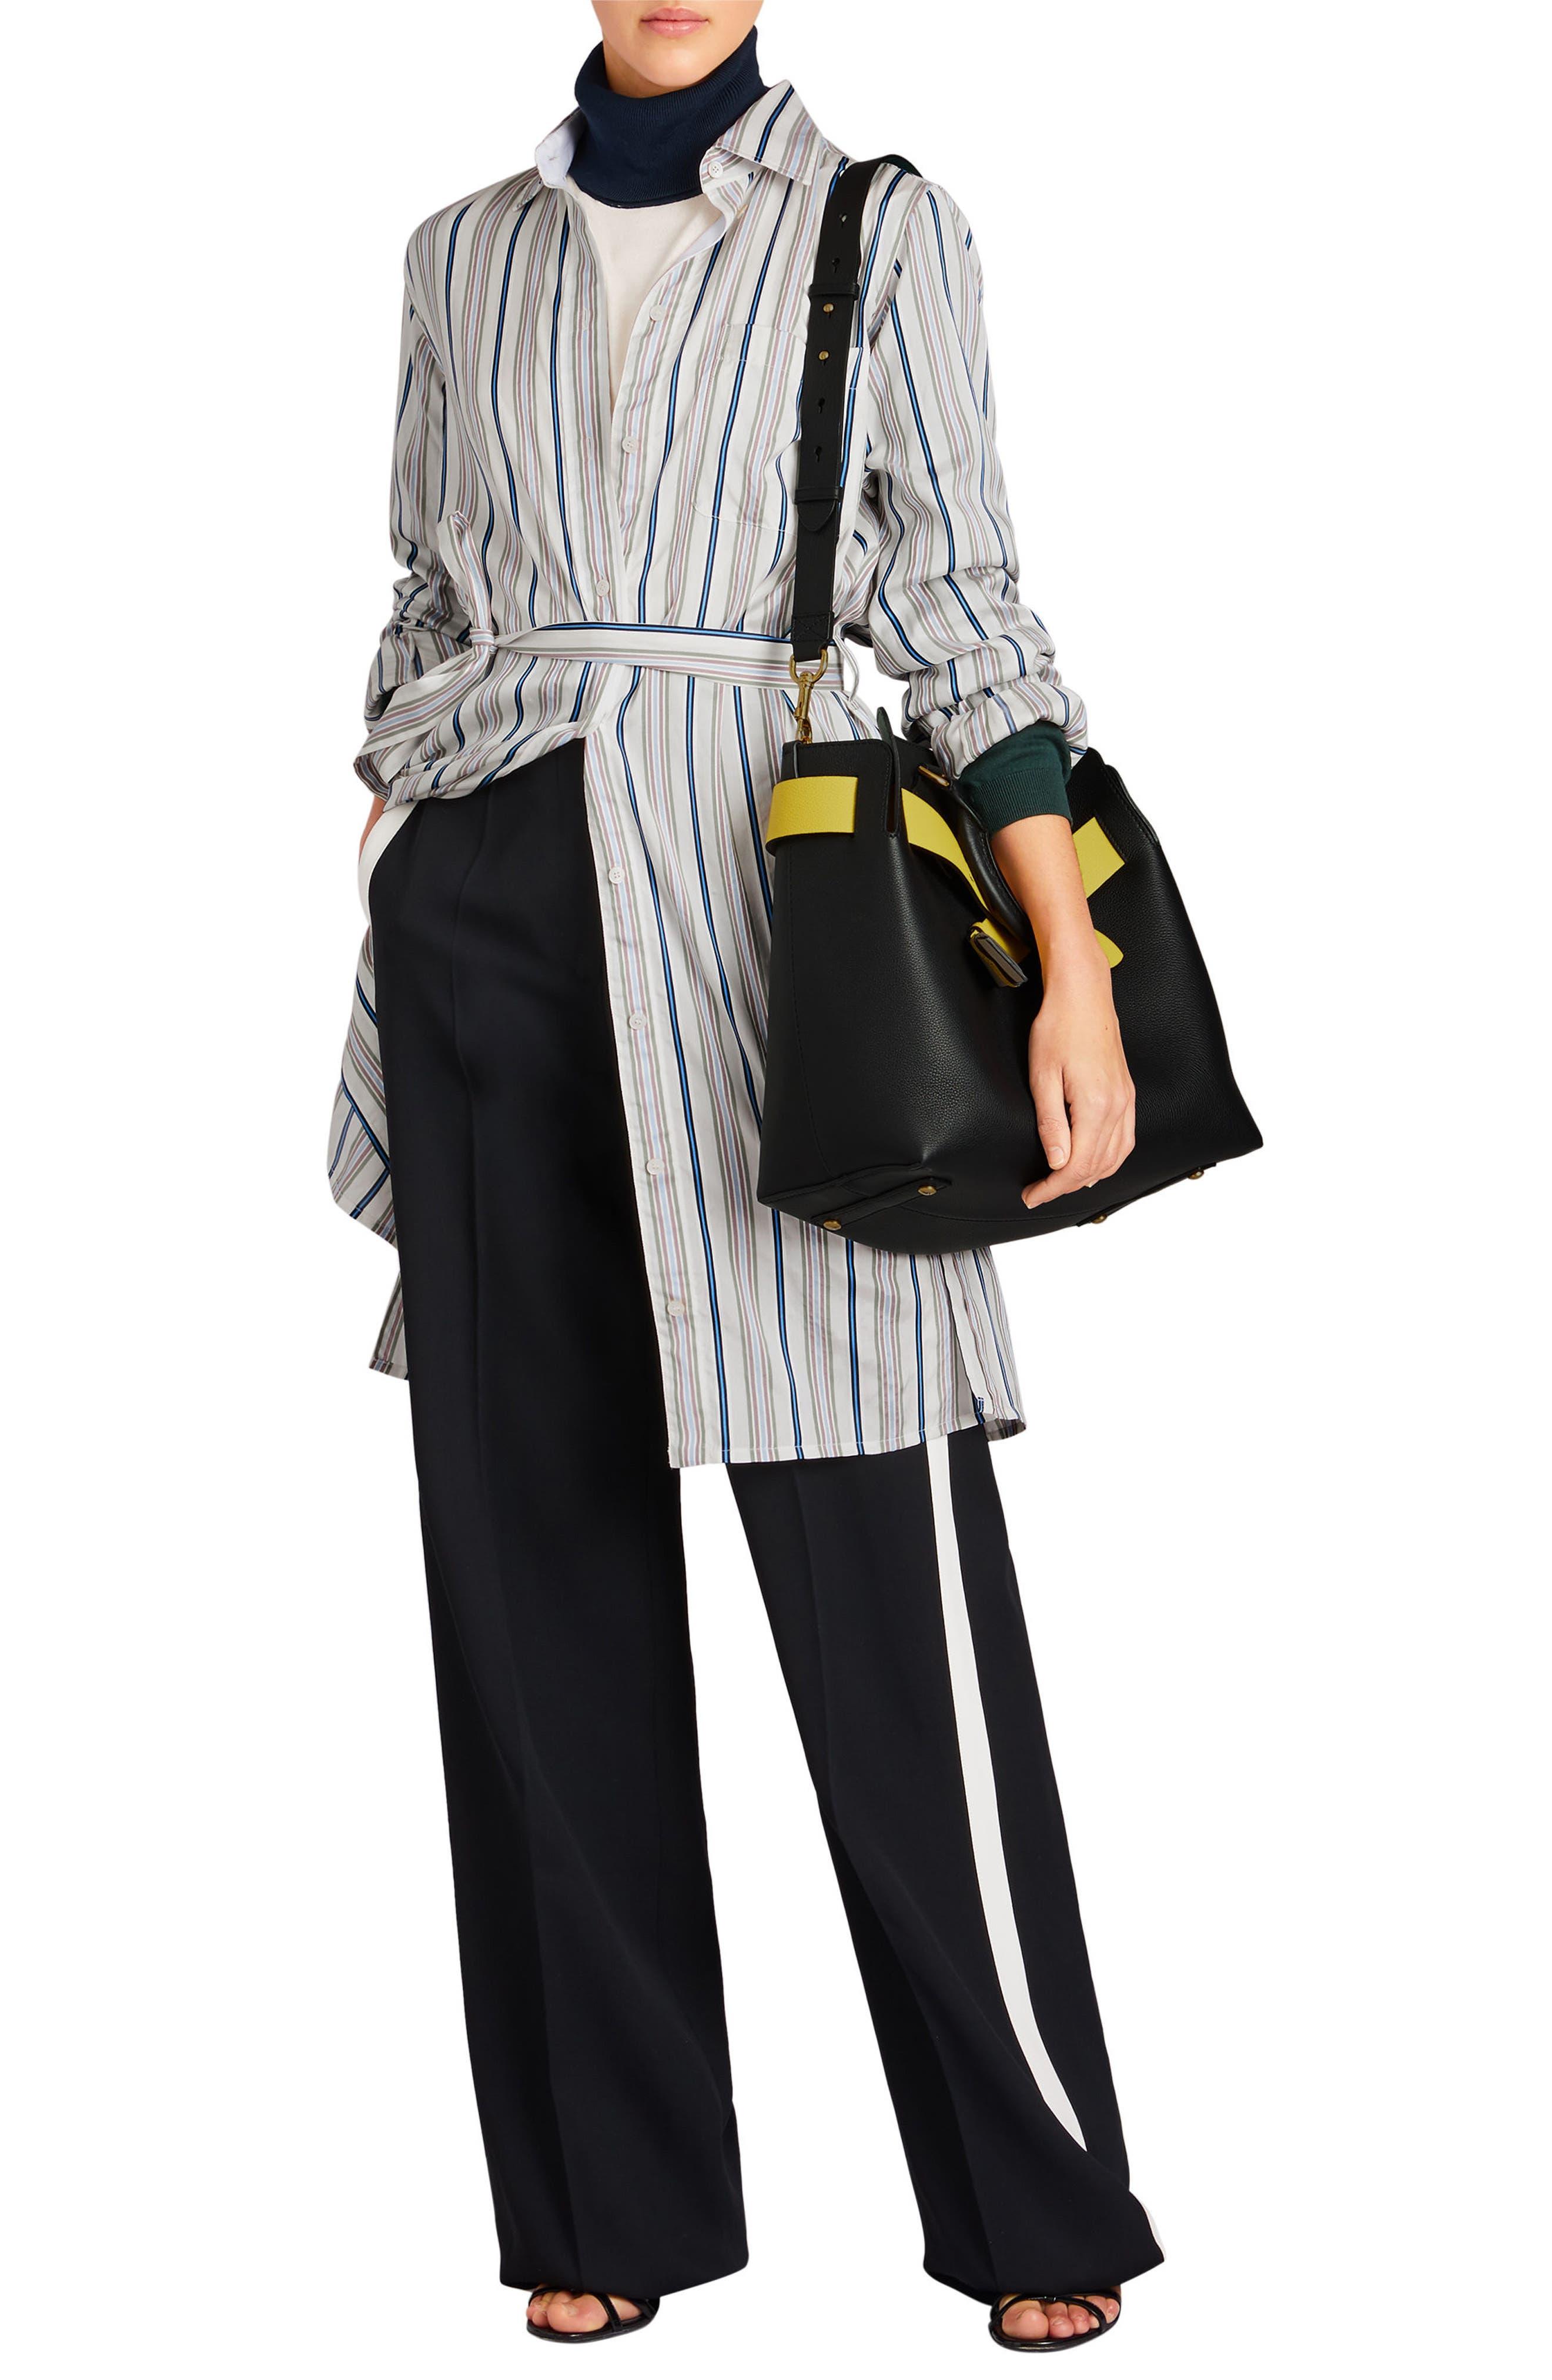 Medium Belt Bag Leather Tote,                             Alternate thumbnail 7, color,                             001